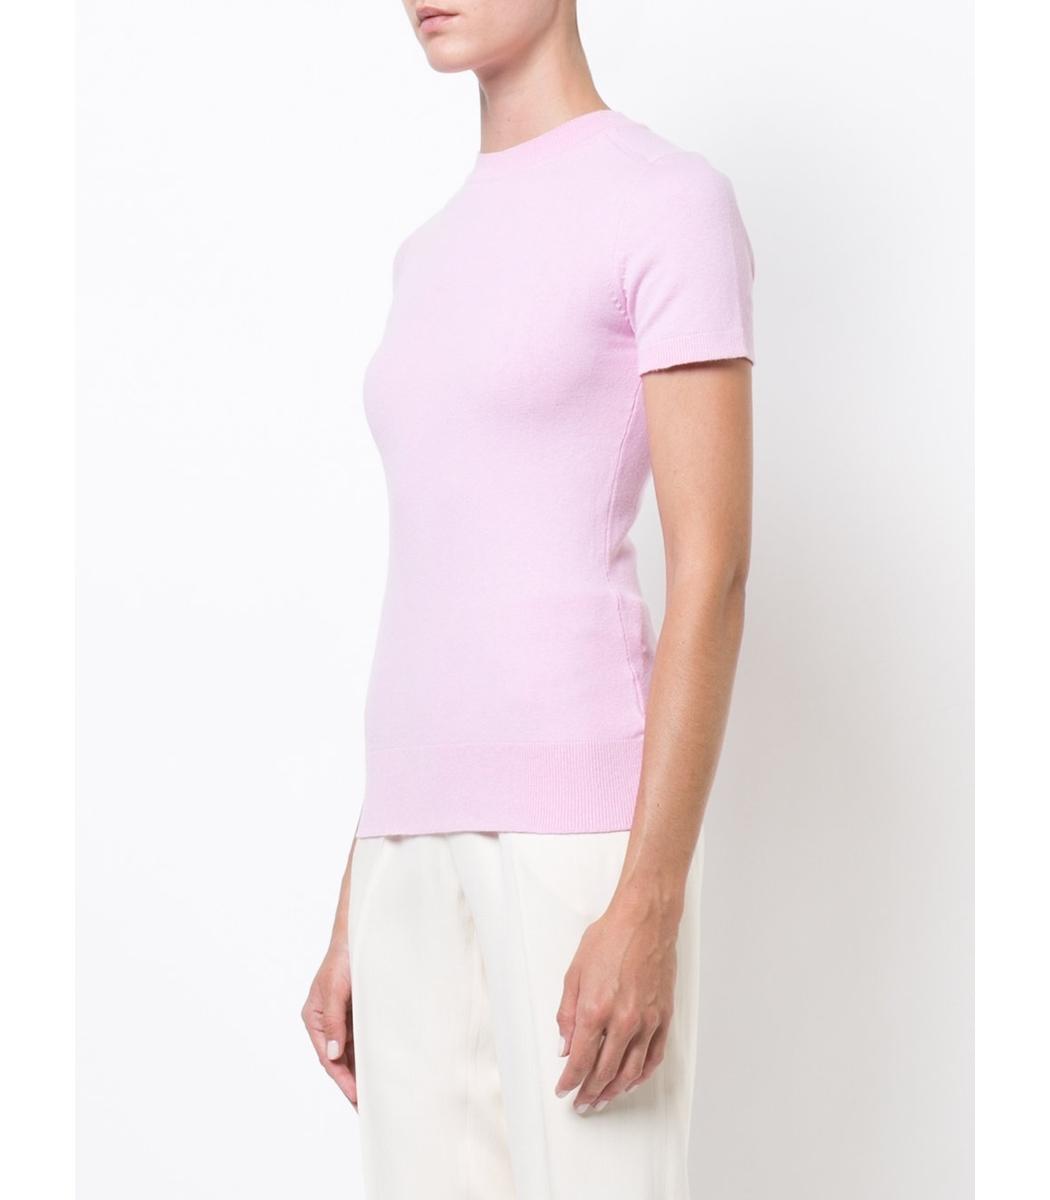 JoosTricot Short Sleeve Sweater - Pink Silk Sweater